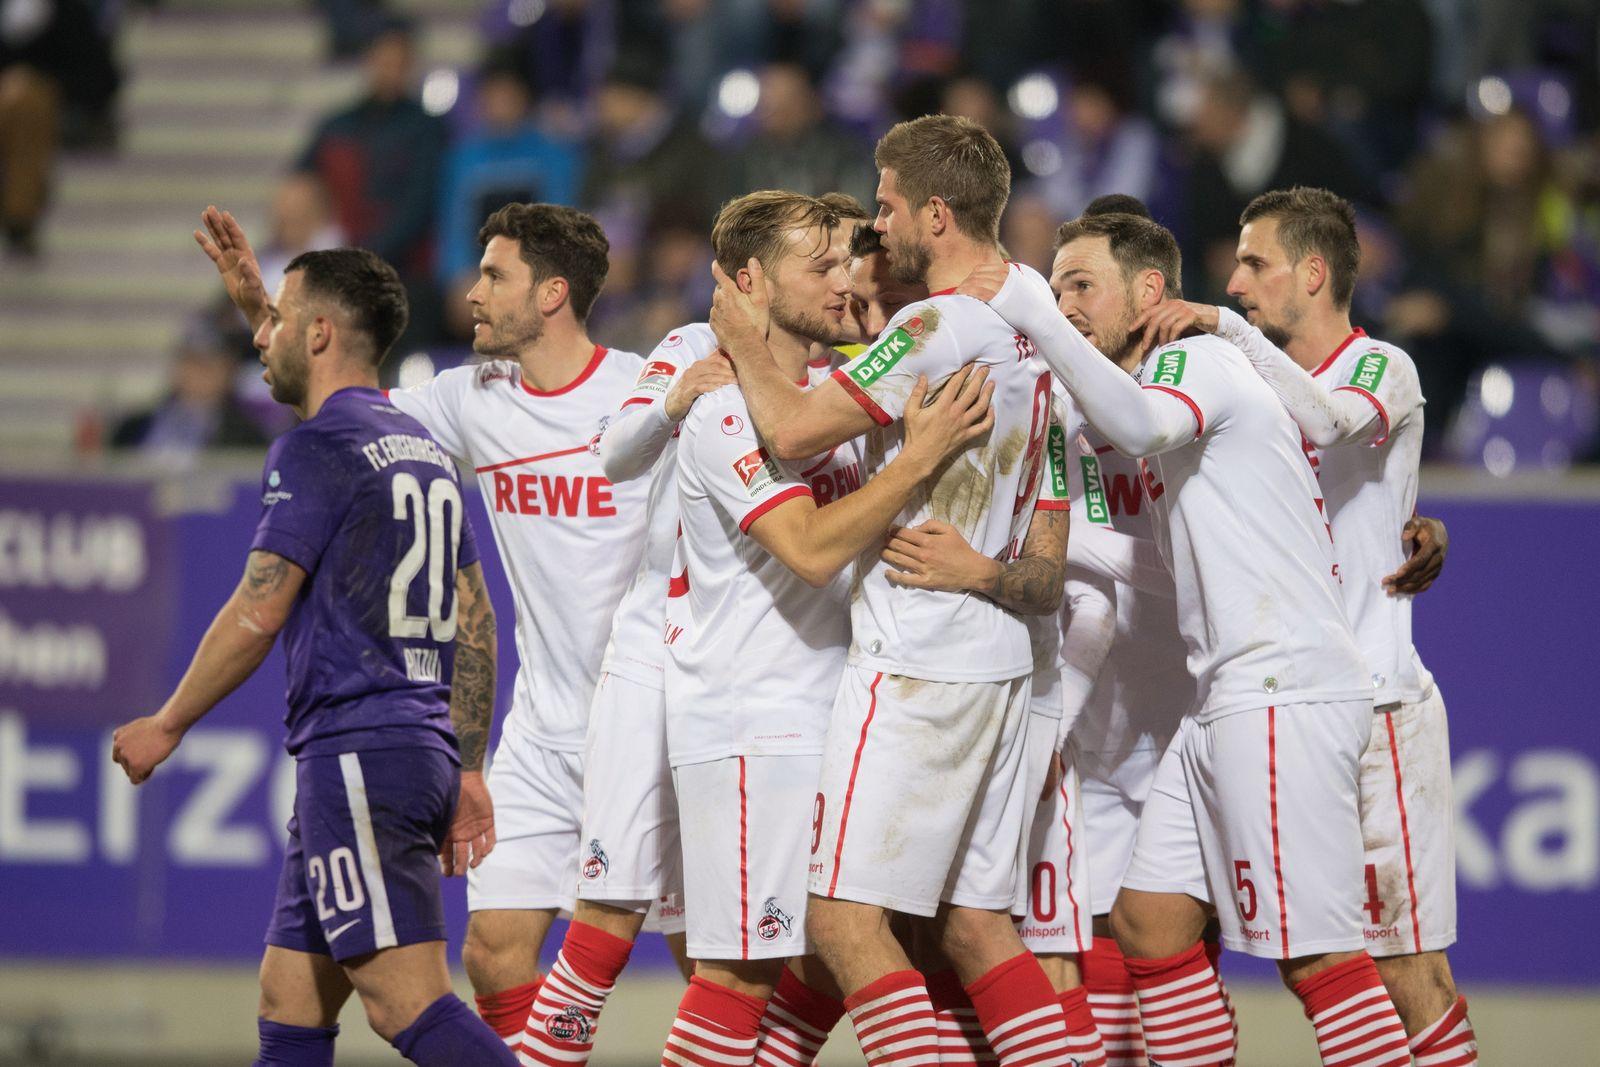 Erzgebirge Aue - 1. FC Köln